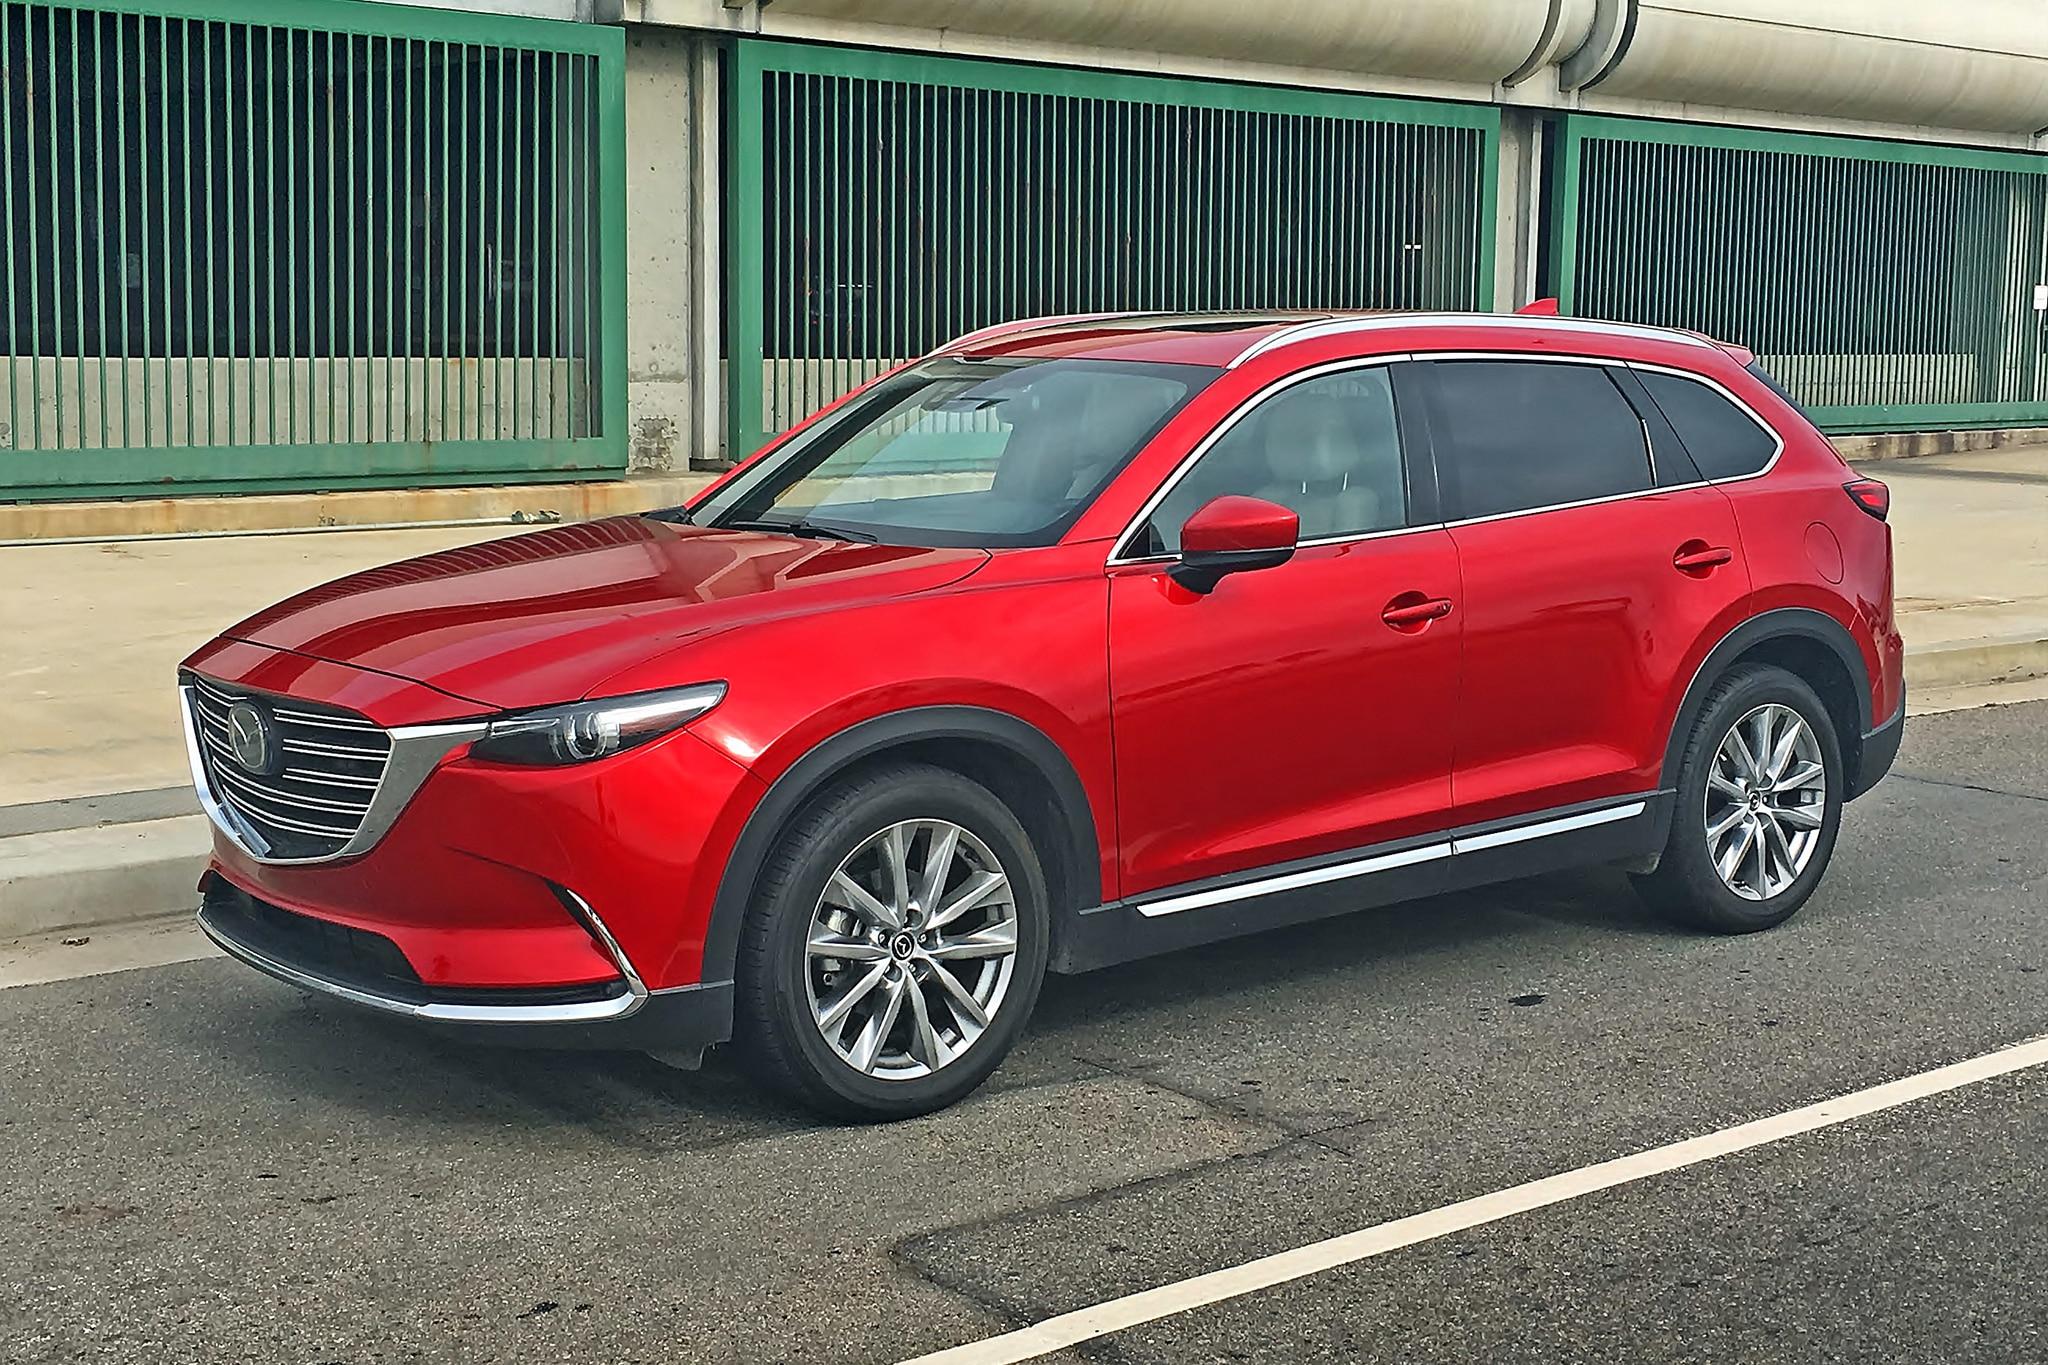 2017 Mazda CX 9 Front Three Quarter 02